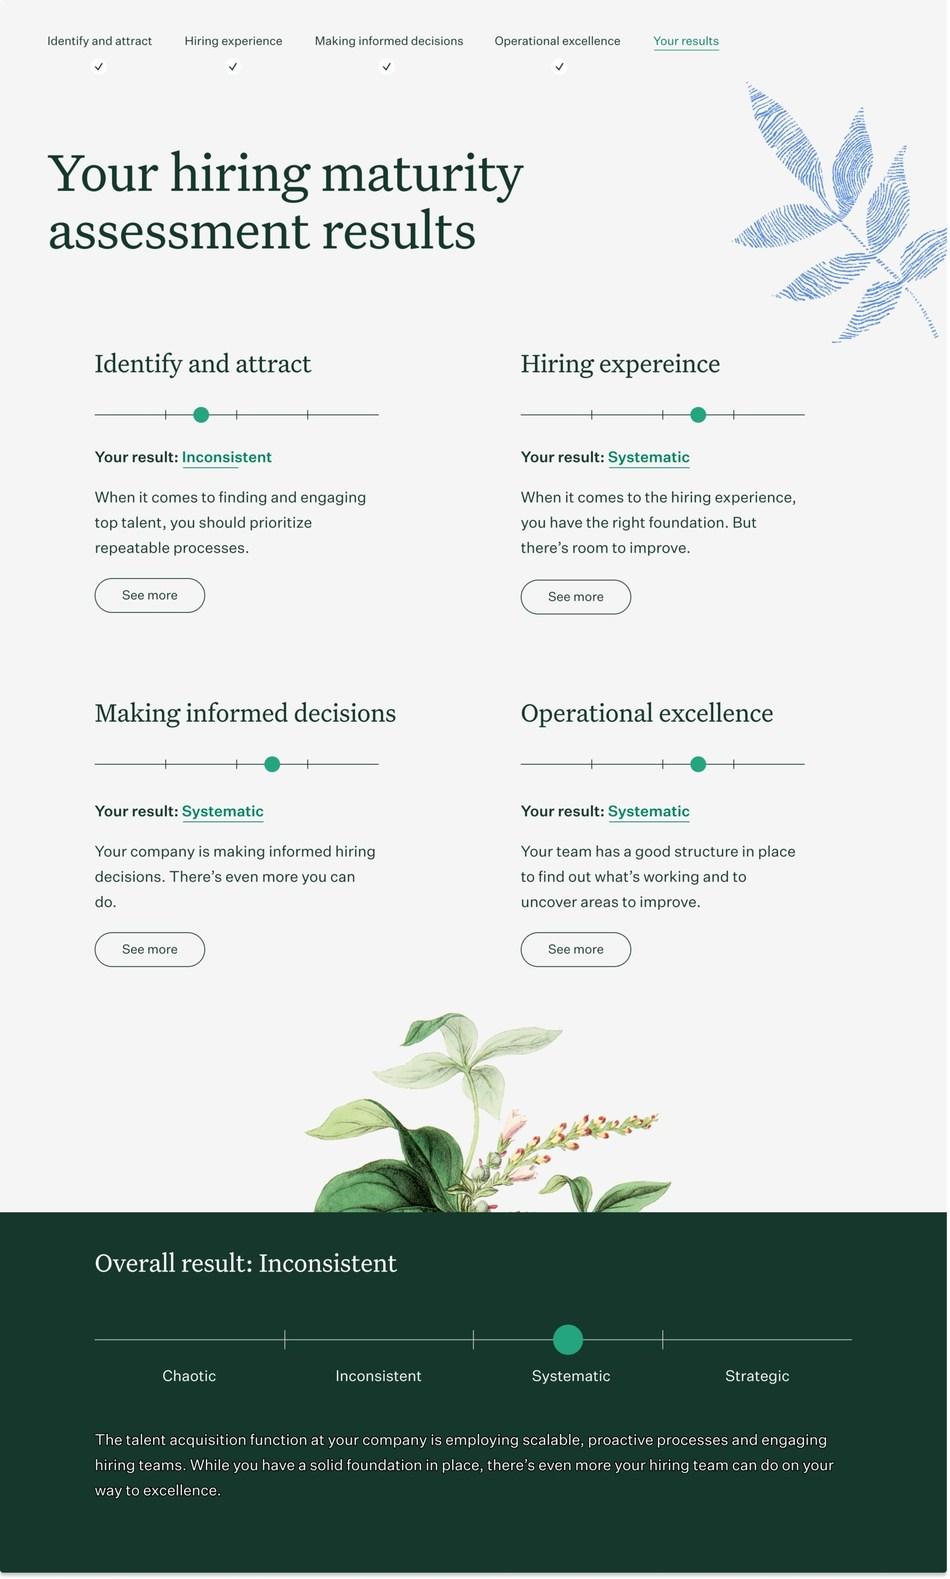 Snapshot of Greenhouse Hiring Maturity assessment results